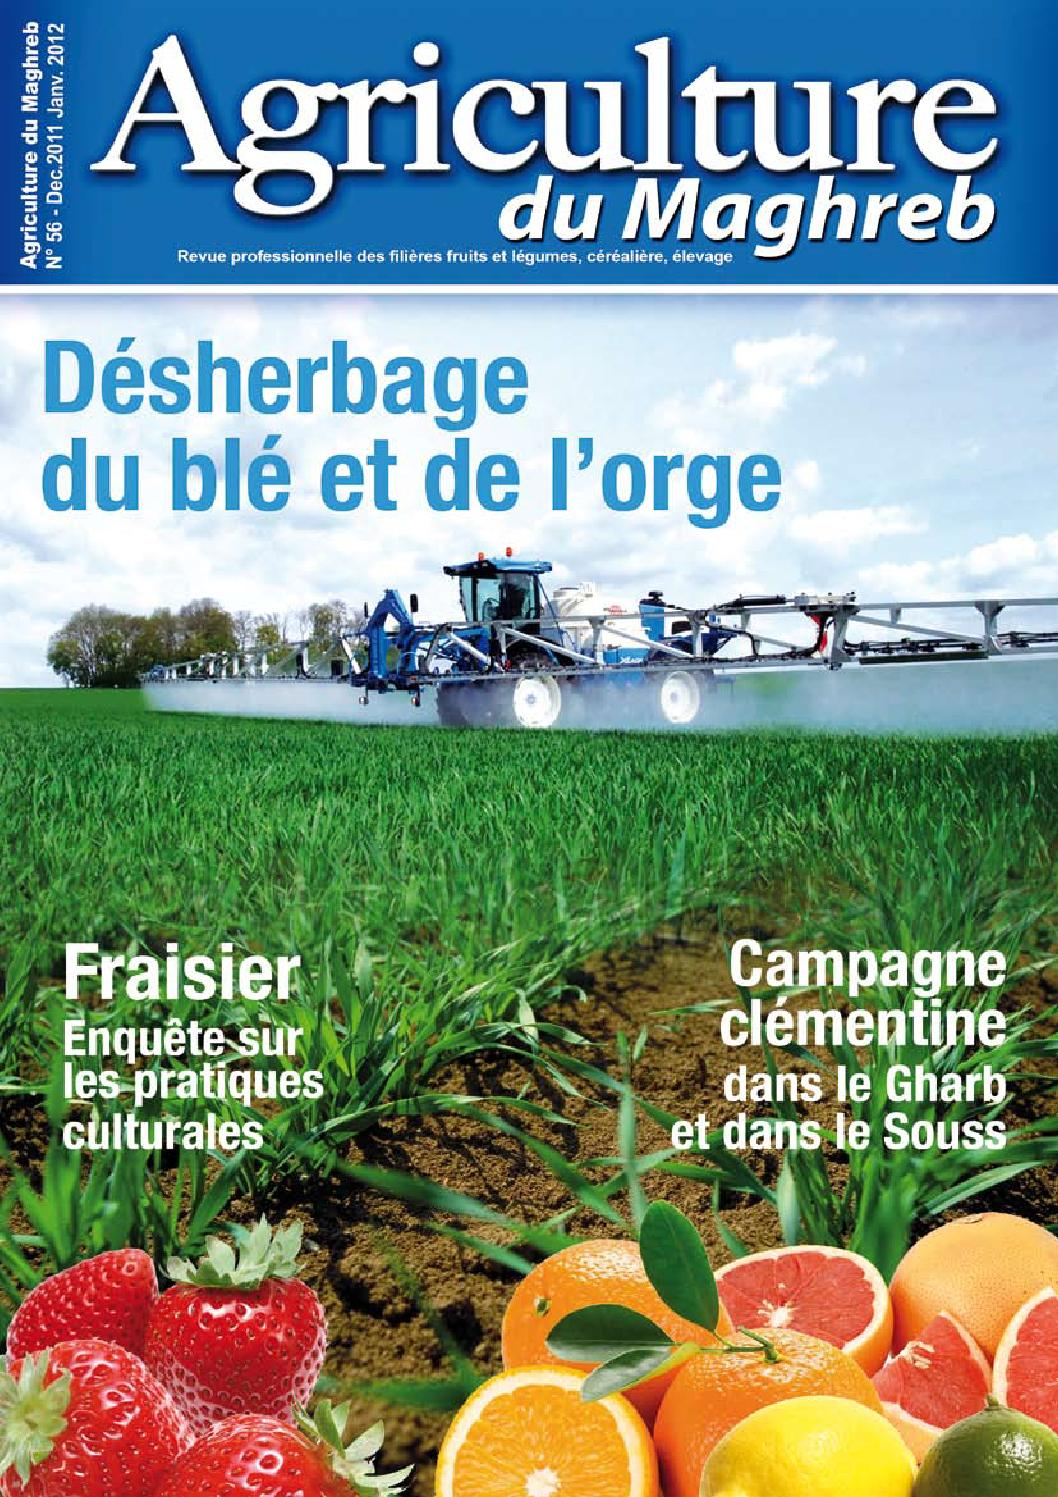 Center for Crop Diversification